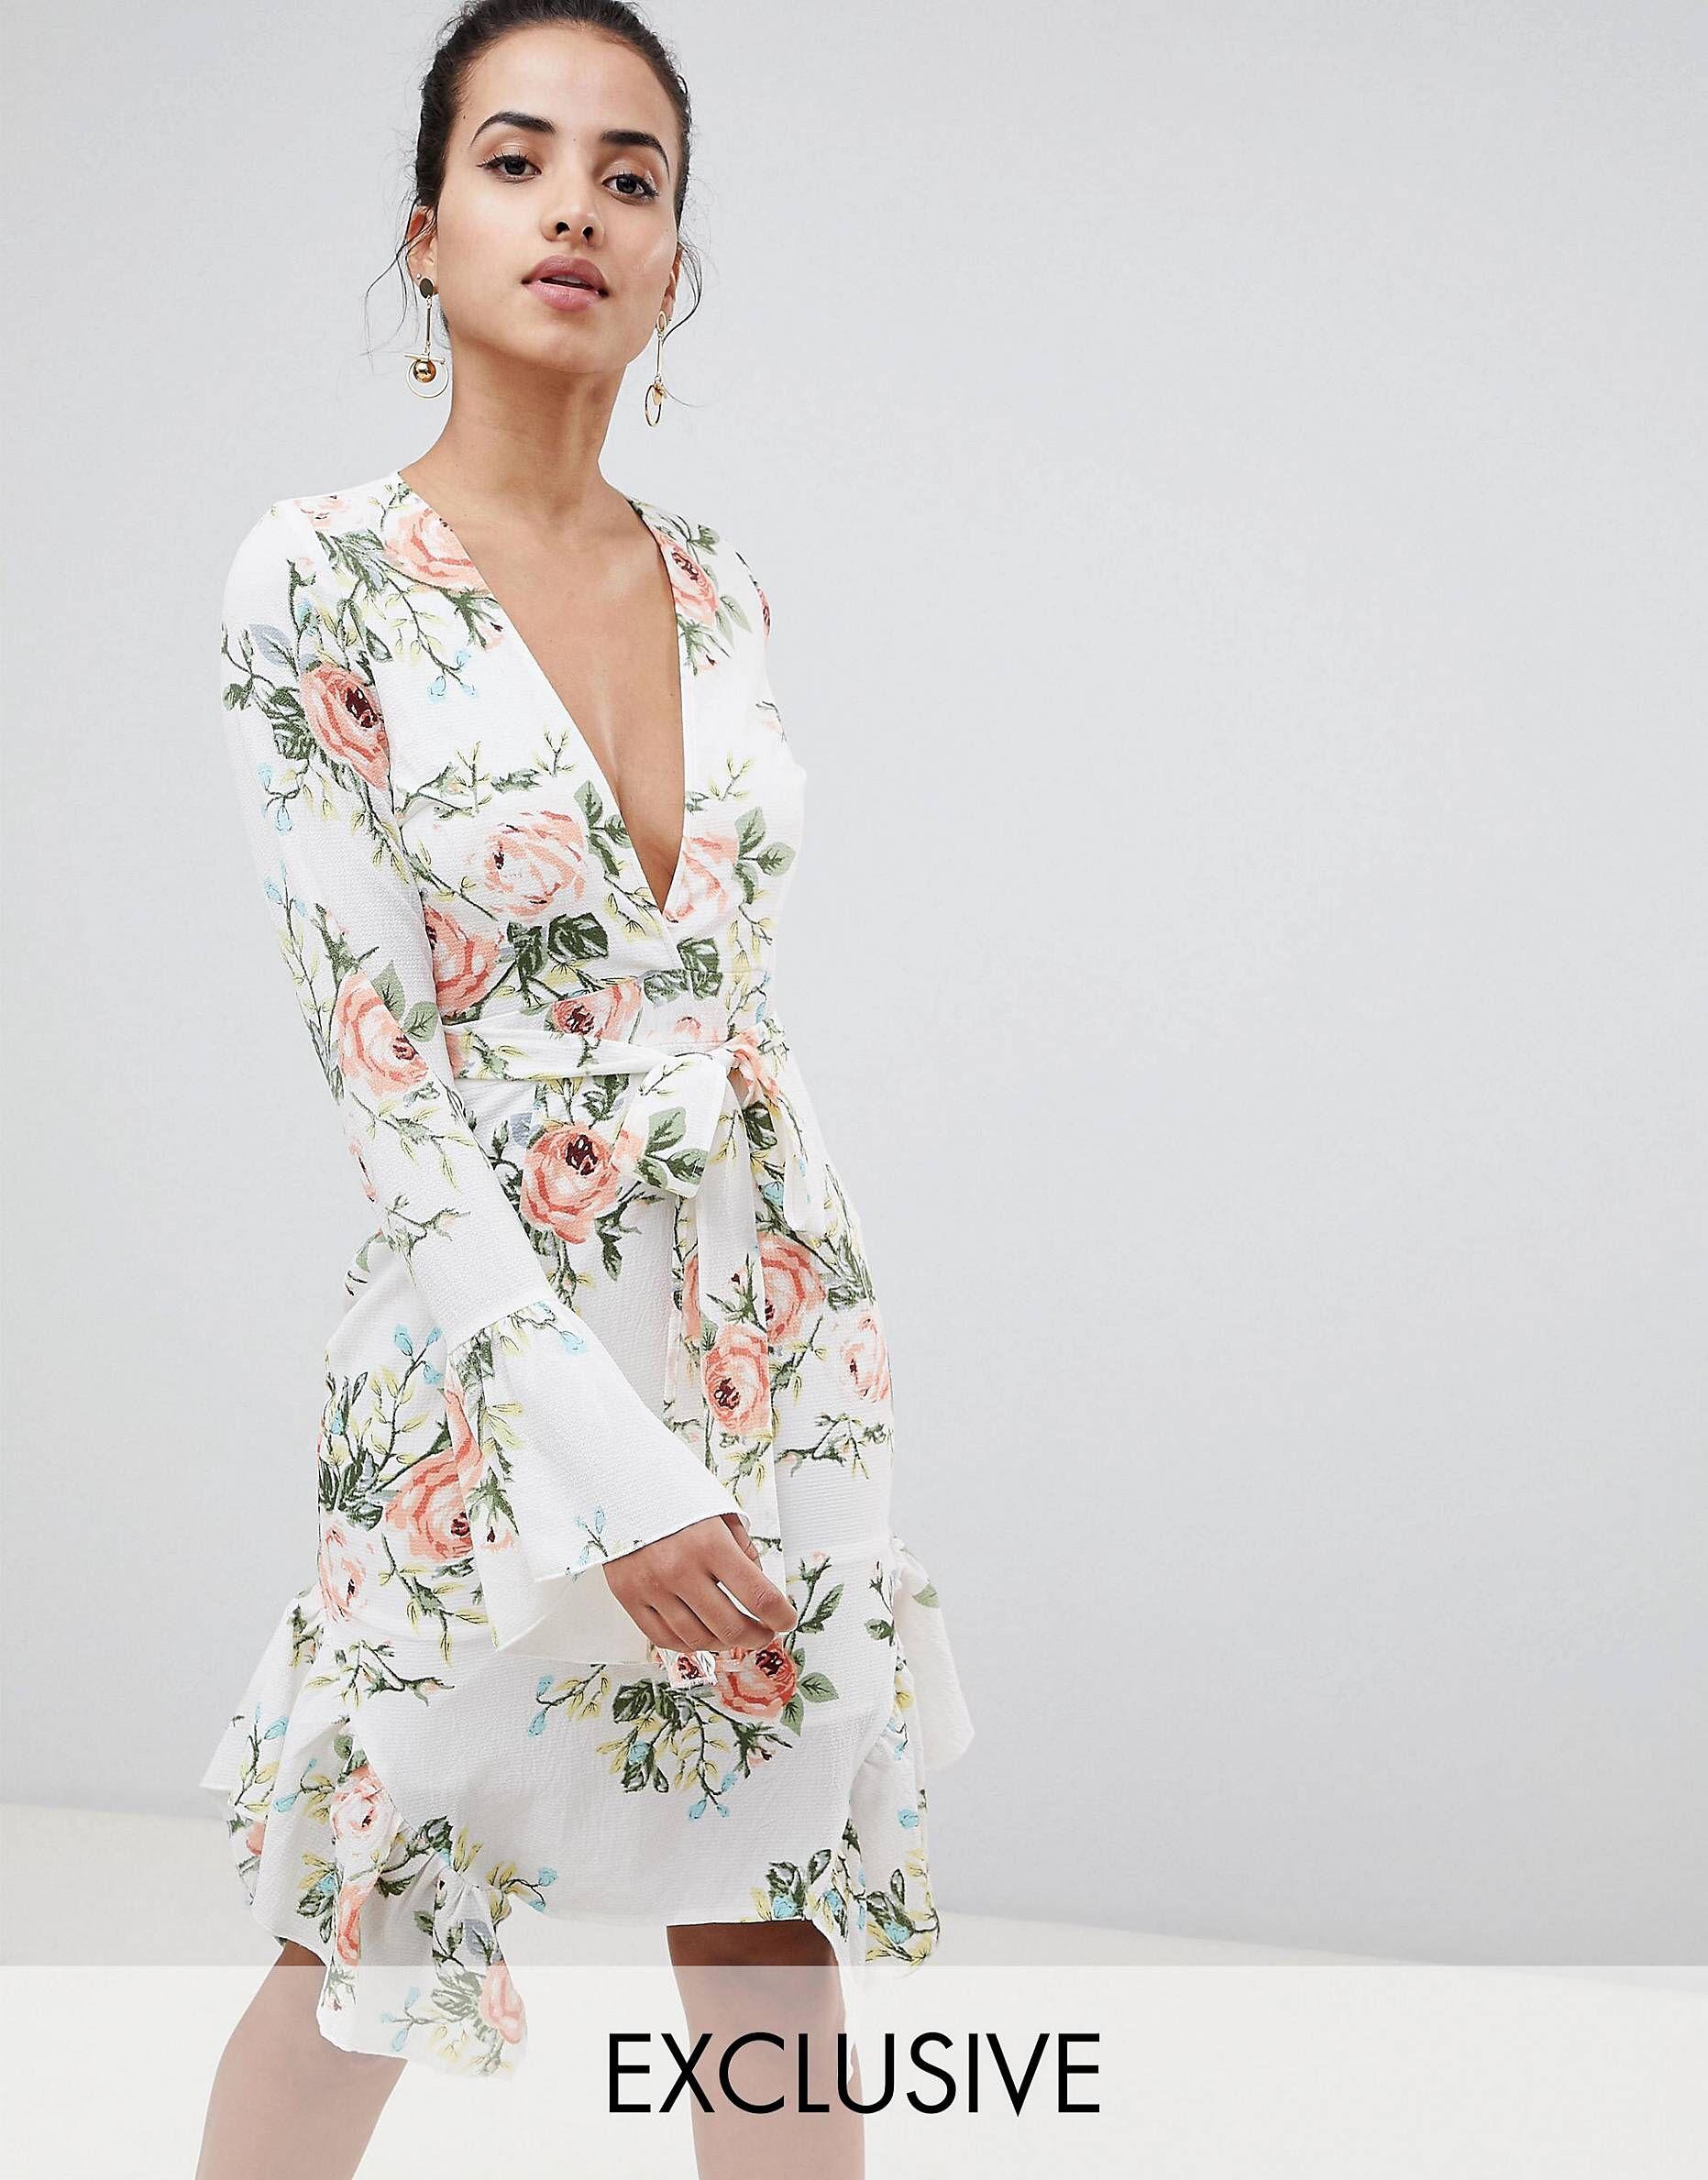 ab574d82e PrettyLittleThing exclusive floral wrap dress